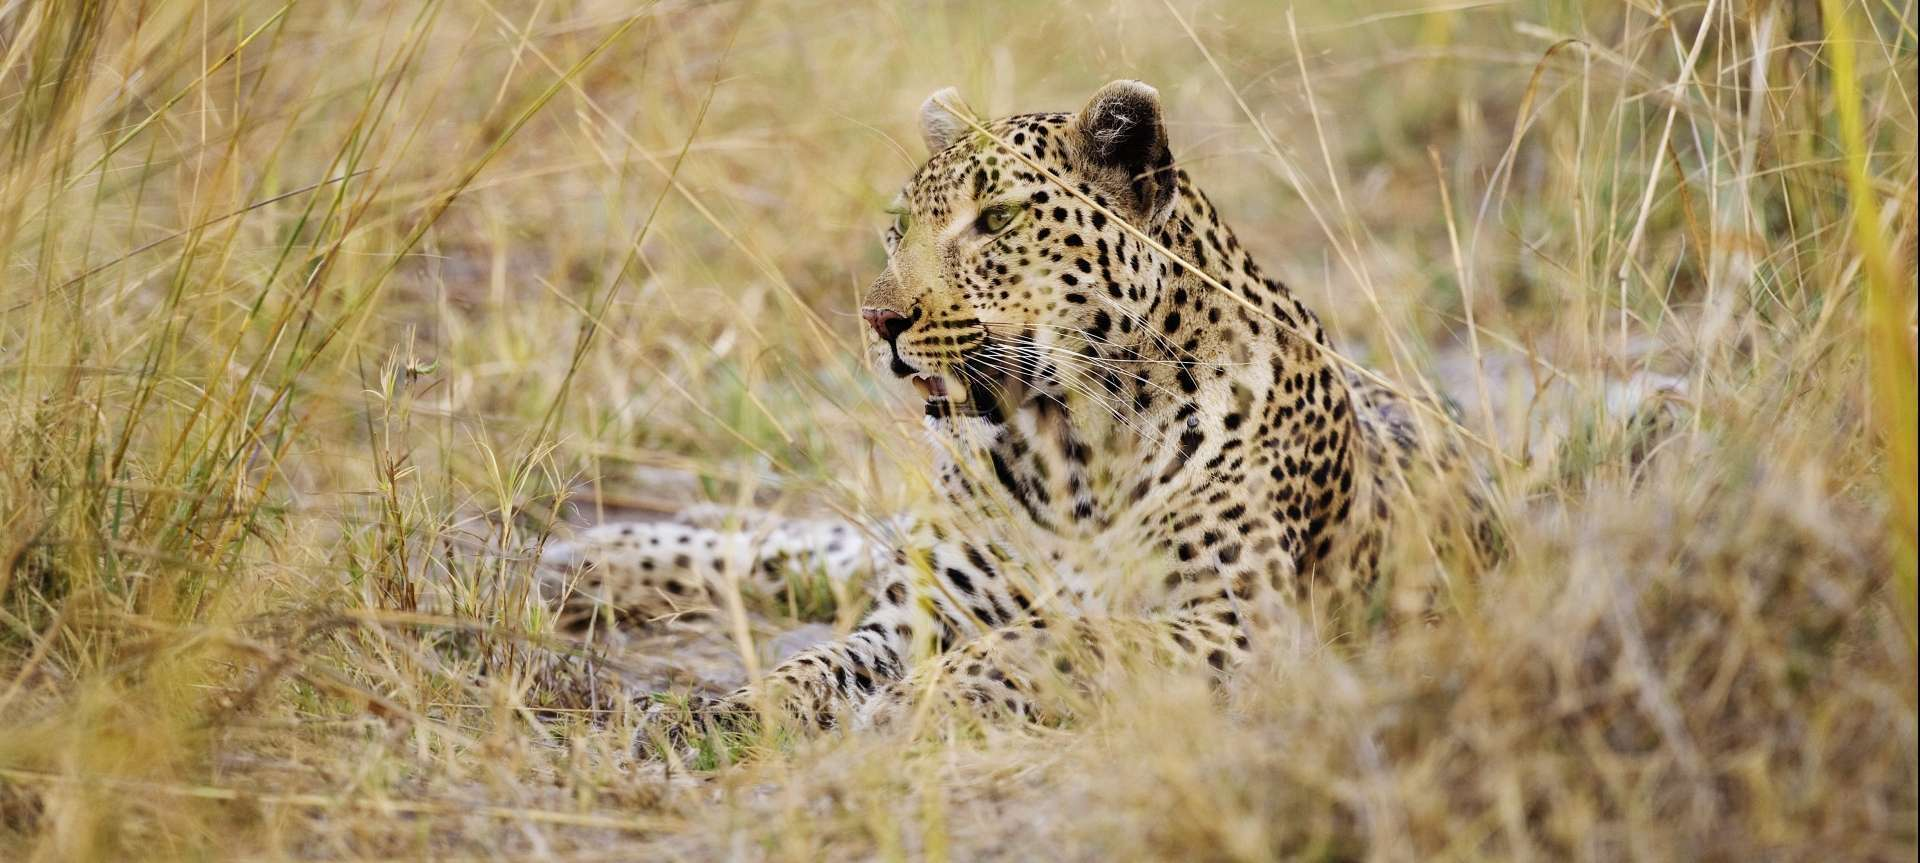 Northern Okavango - Africa Wildlife Safaris